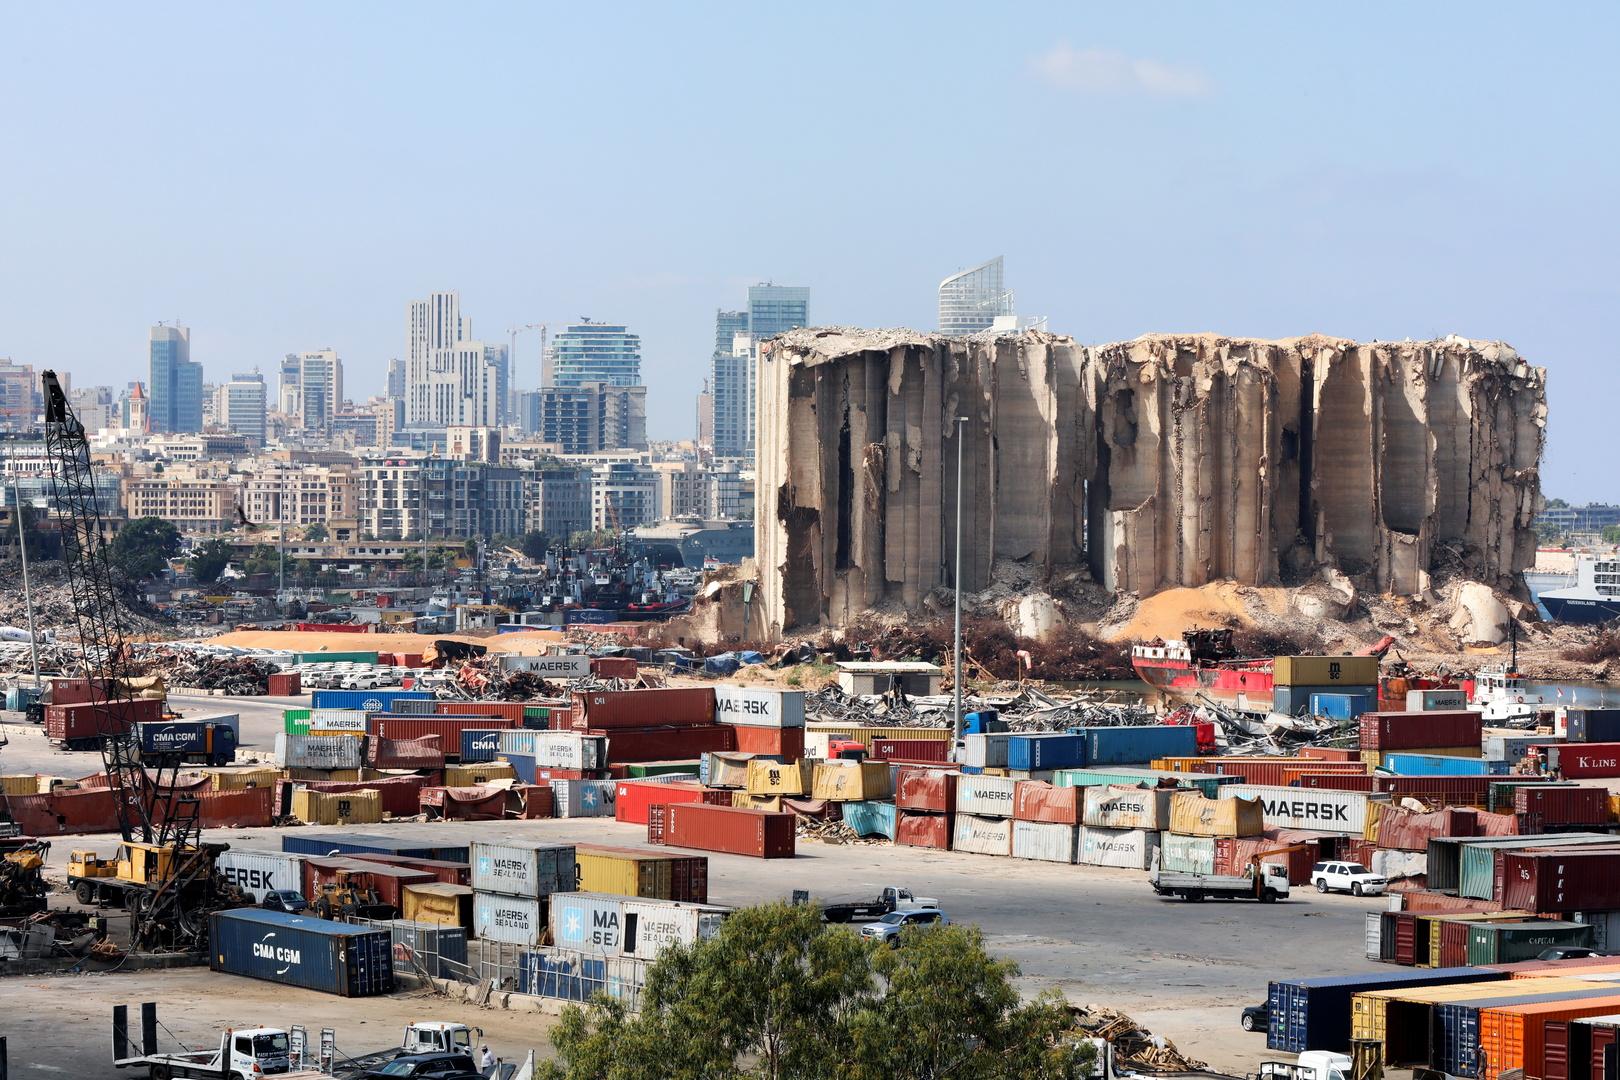 لبنان.. خطر جديد داخل مرفأ بيروت (صور)